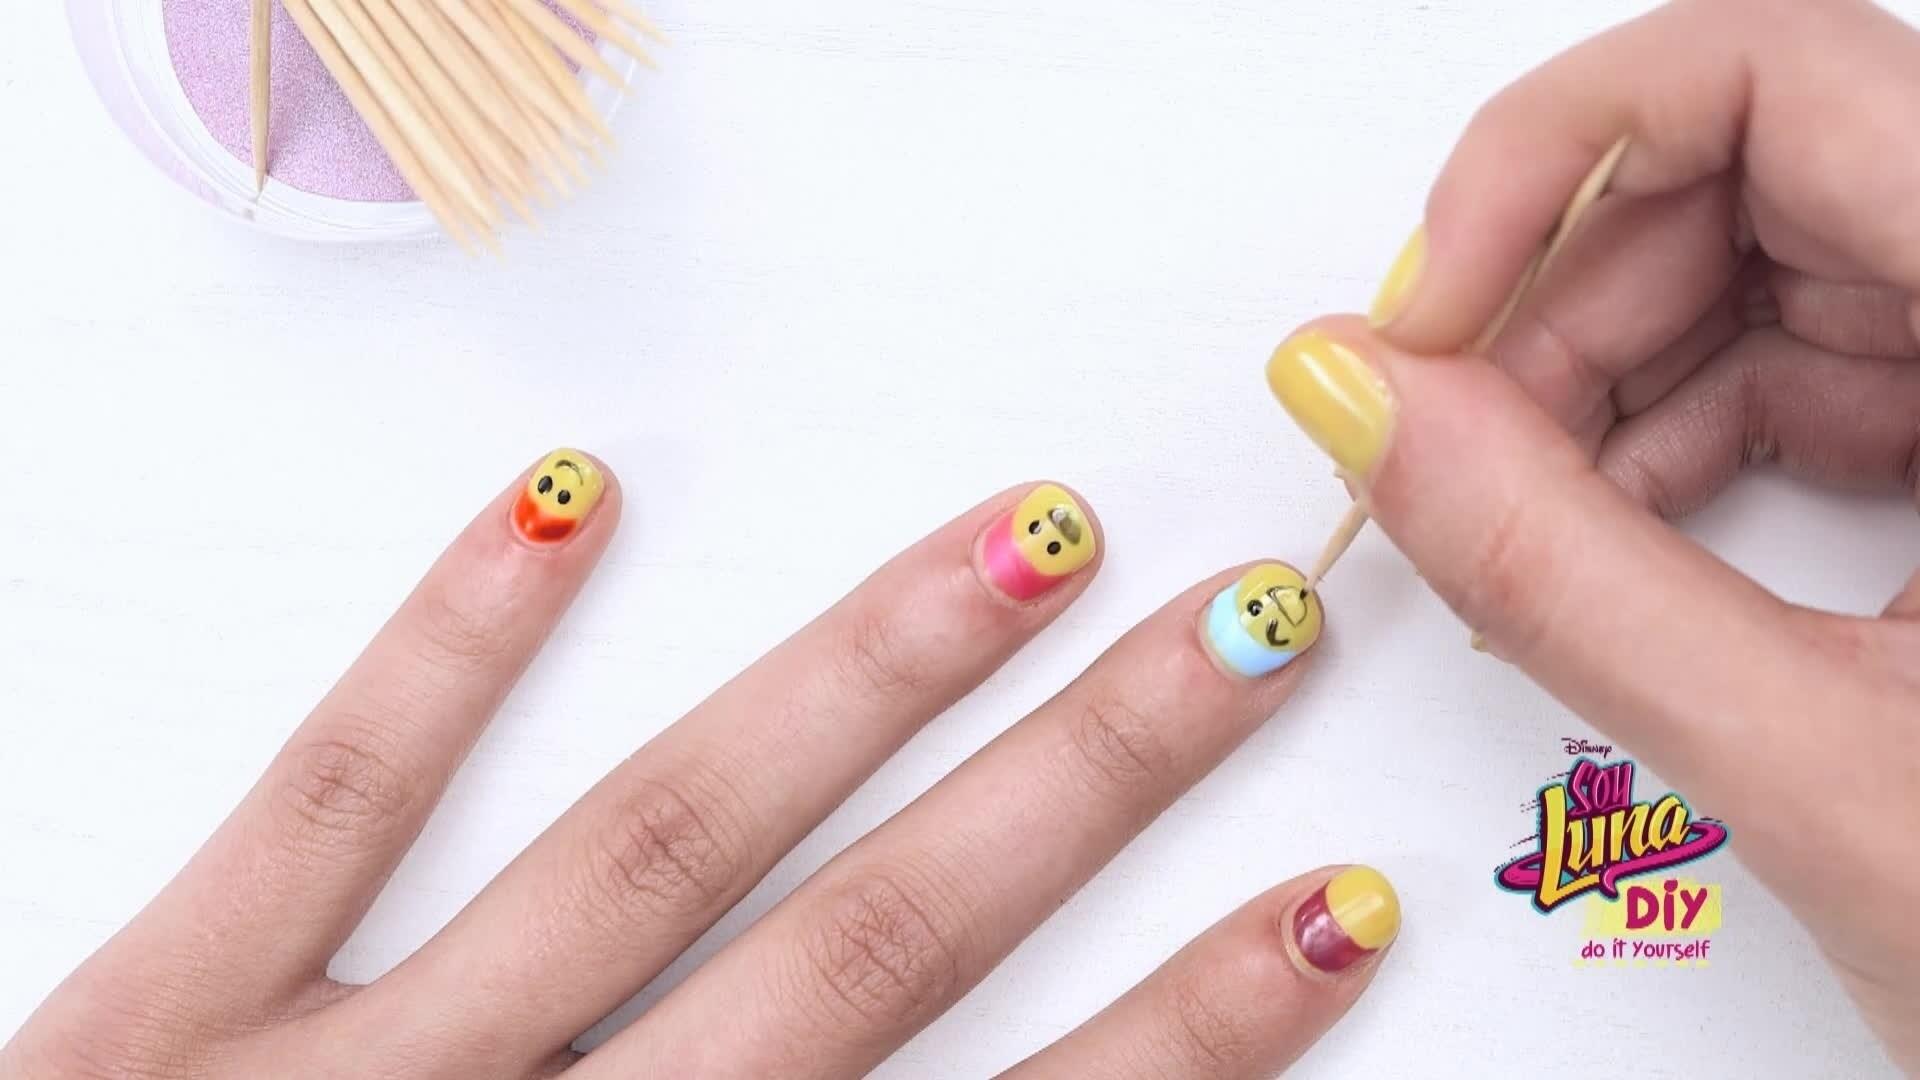 Soy Luna - DIY: Nail art #1